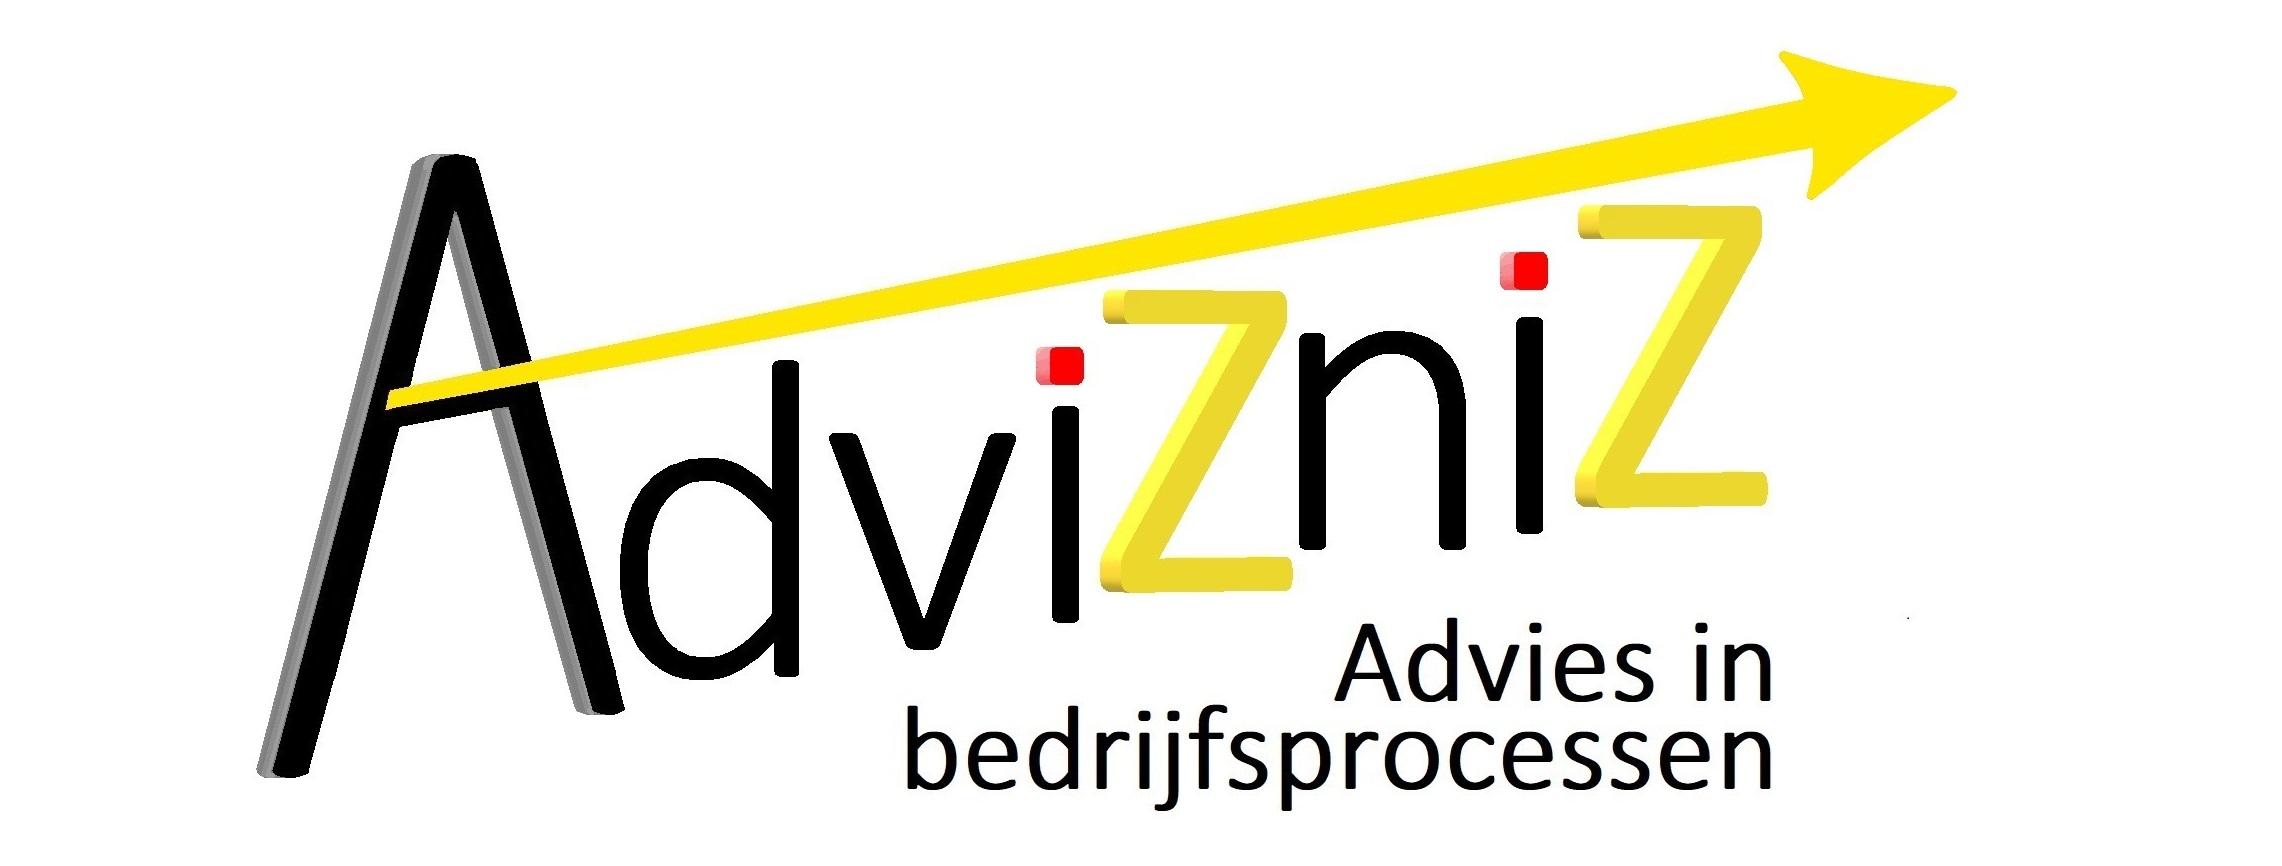 AdviZniZ : Advies in bedrijfsprocessen